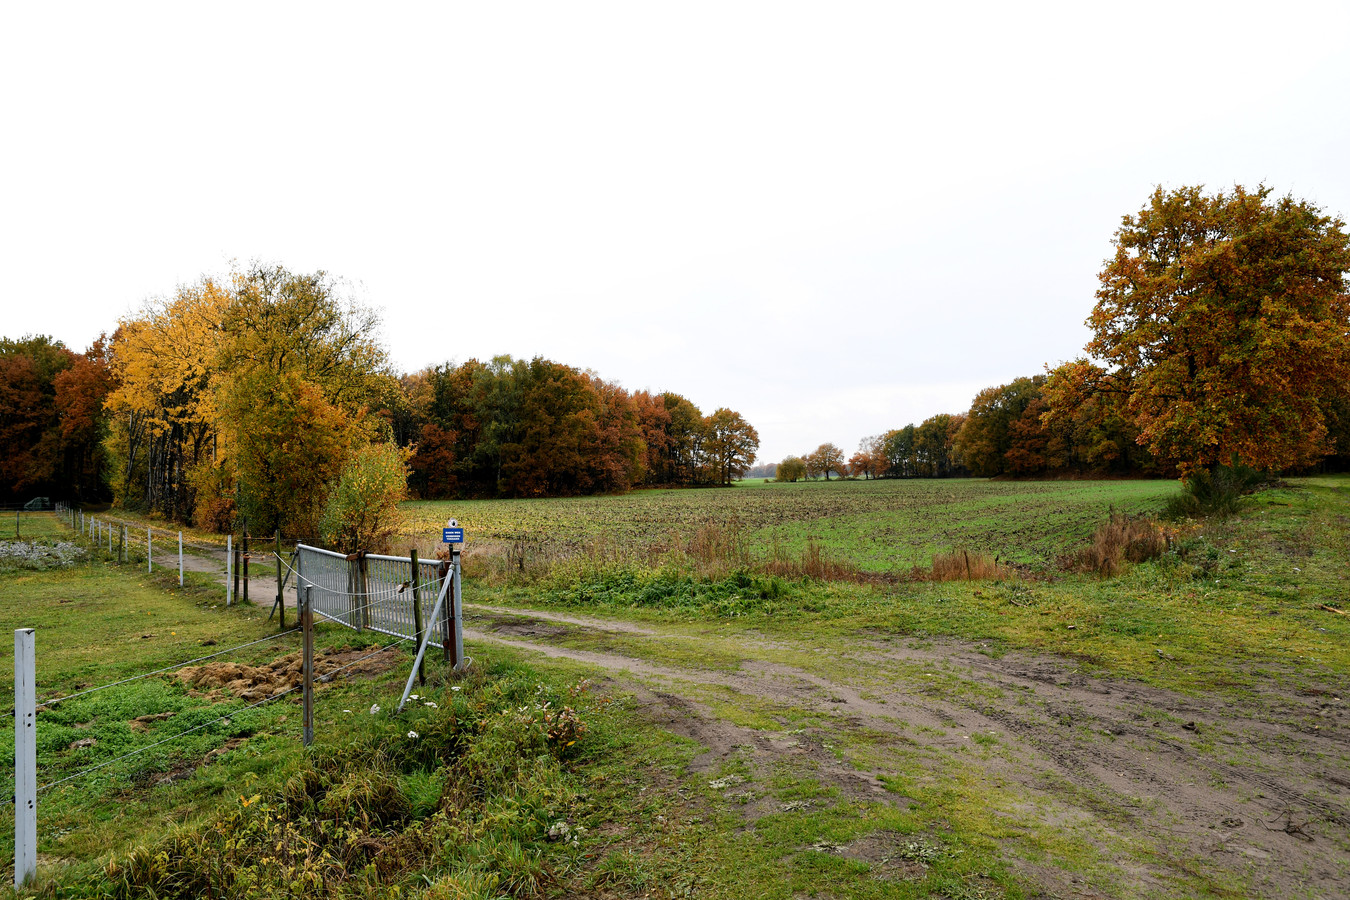 Natuurgebied ''t Blik richting Oosterhout.  Foto Pix4Profs/Jan Stads